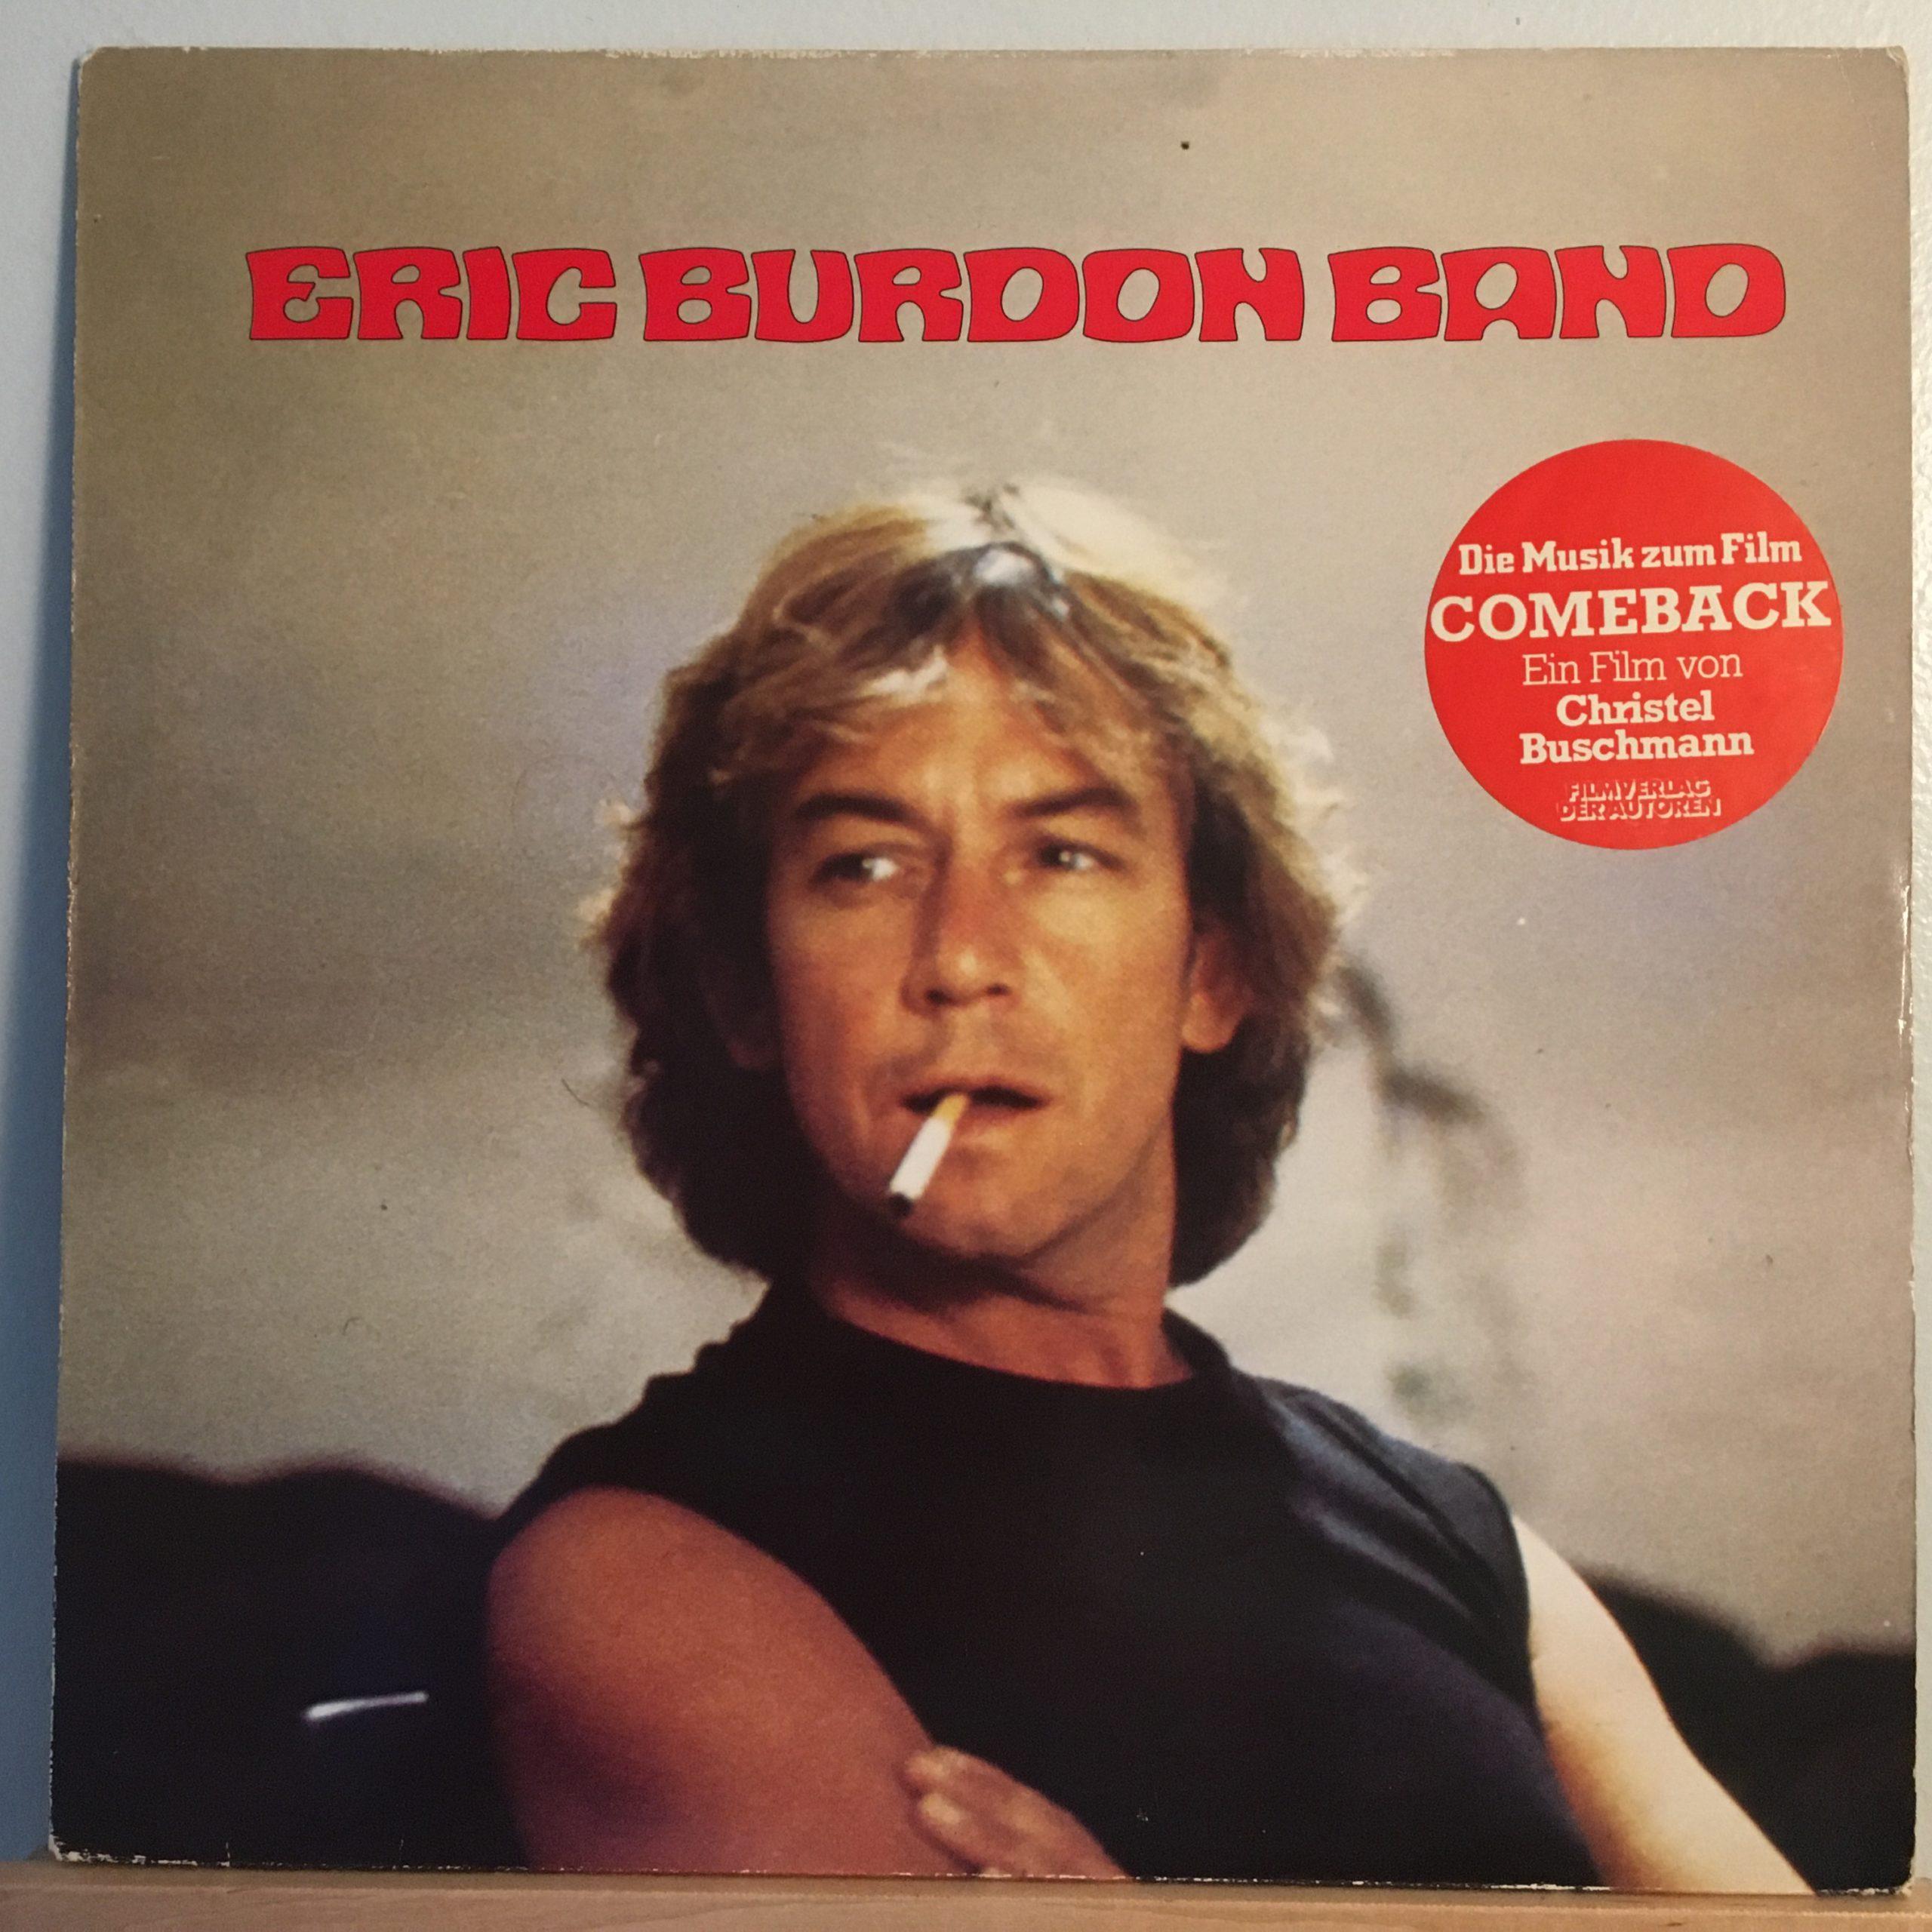 Eric Burdon Band front cover